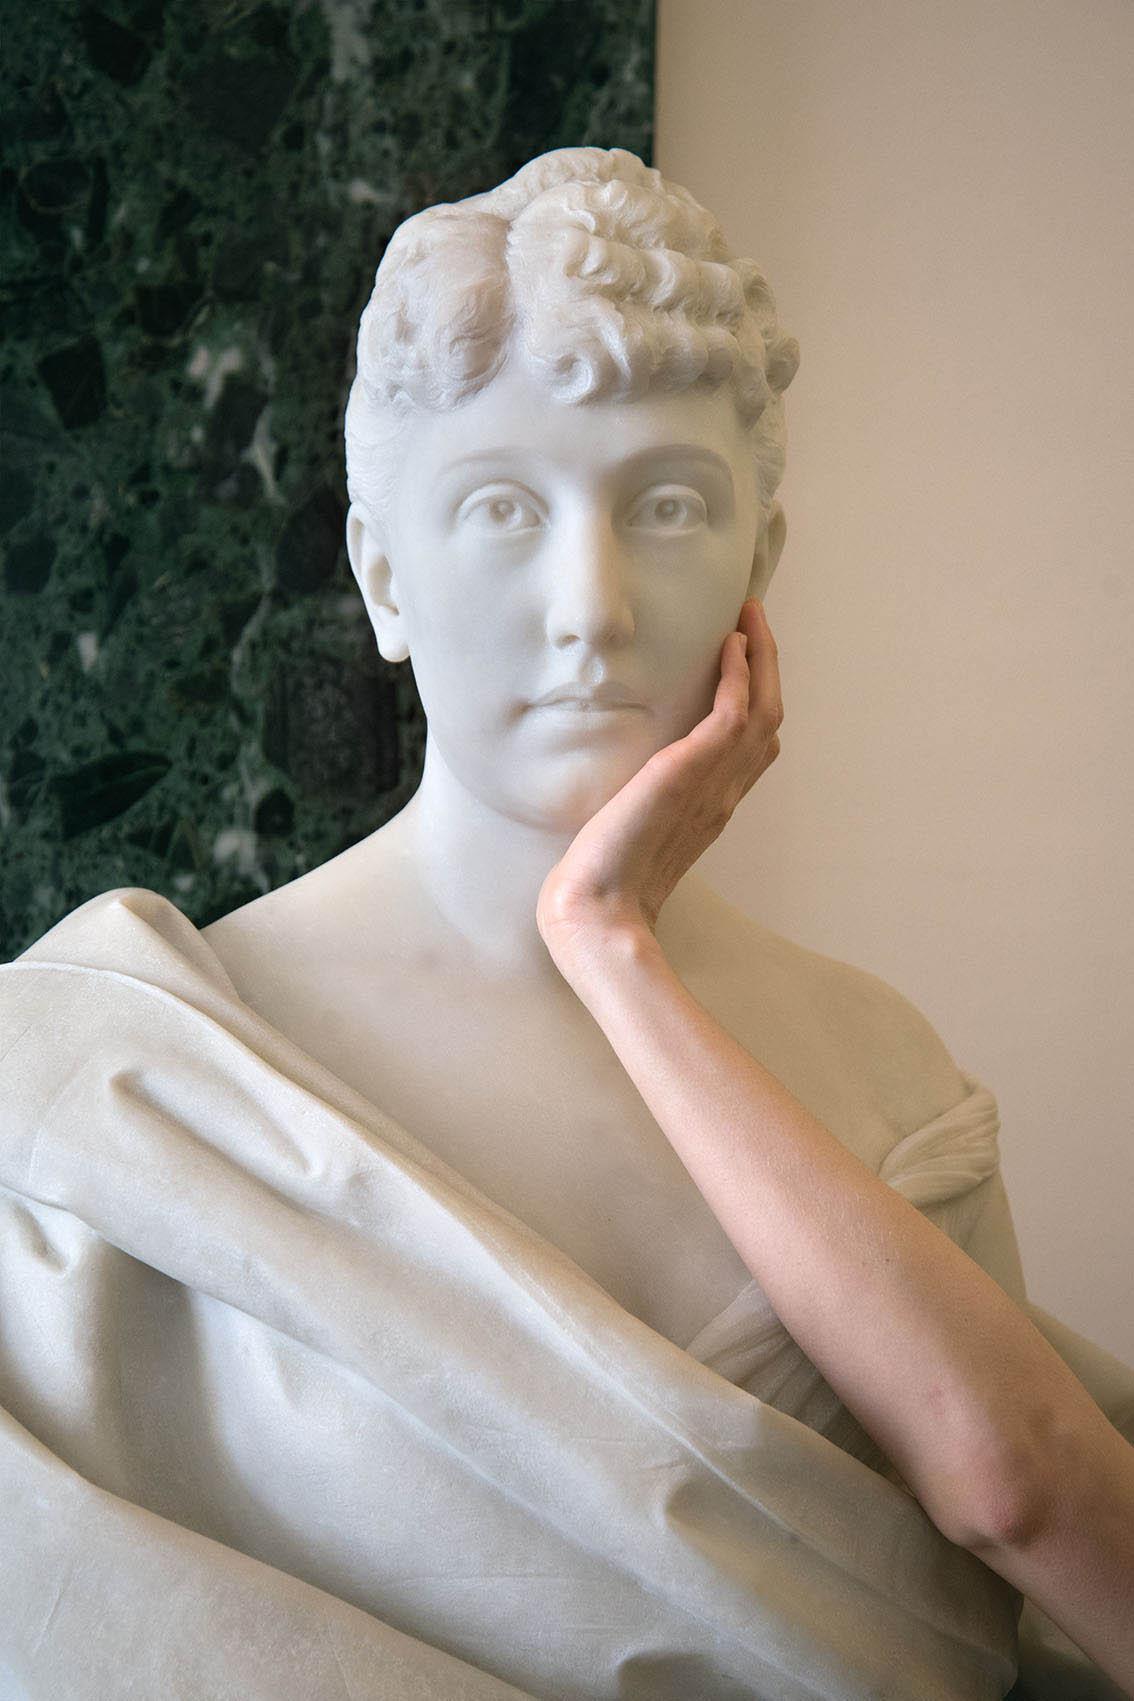 Alice Heine (1857-1925), épouse du Prince Albert Ier de Monaco, buste en marbre blanc par Fabio Stecchi (1855-1928), 1892, Carole. Palais Princier de Monaco. 2018